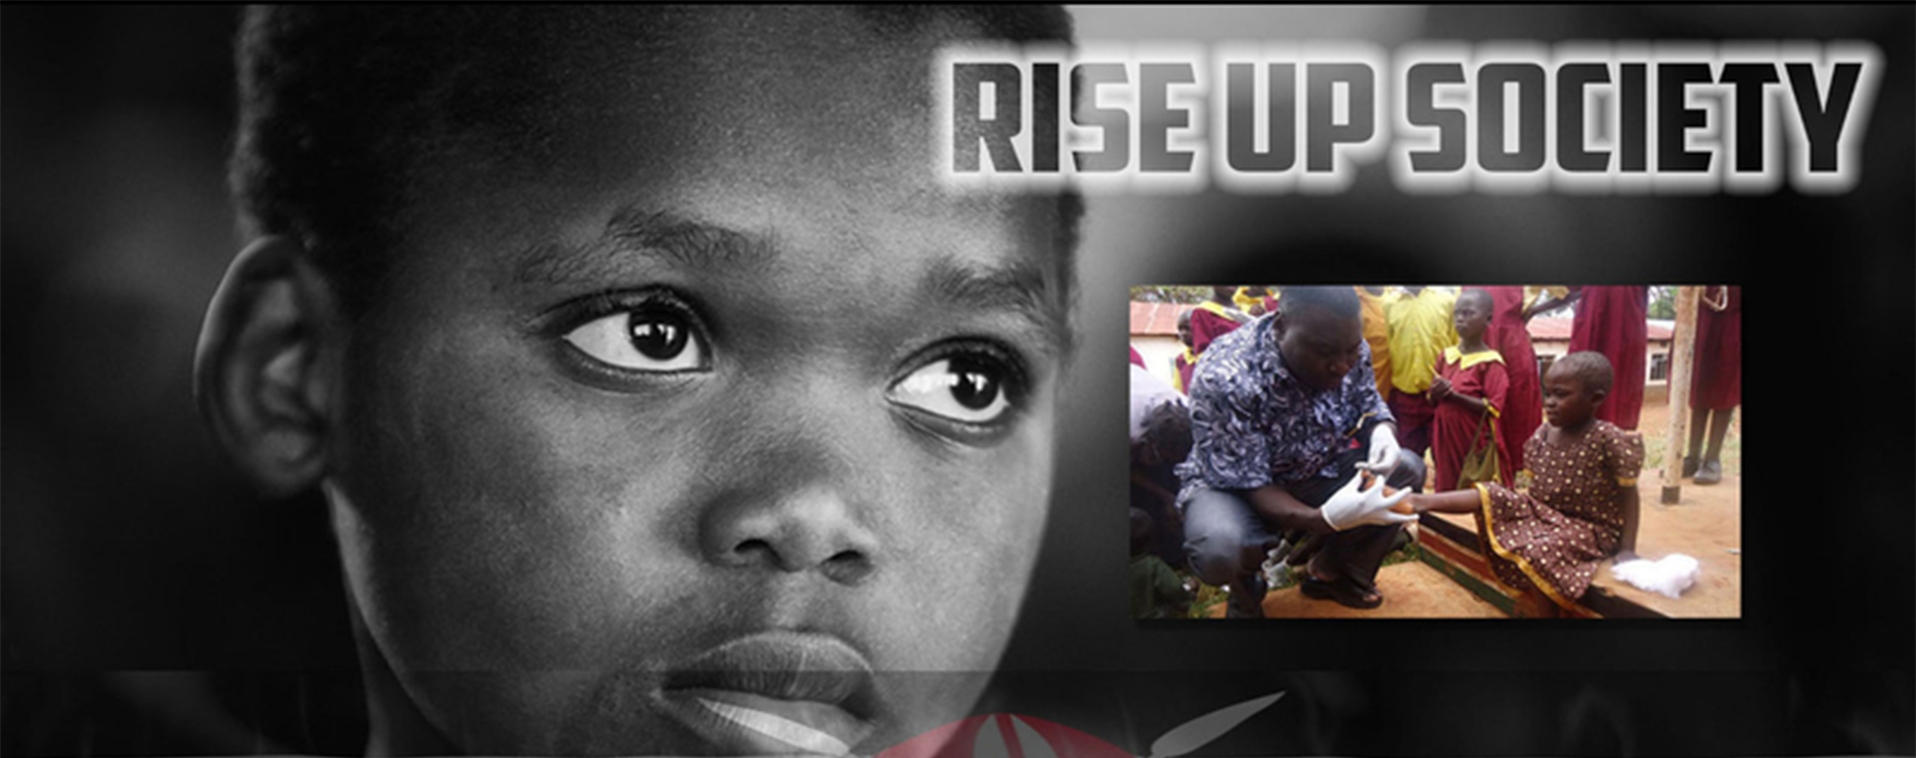 rise up society 1916x758